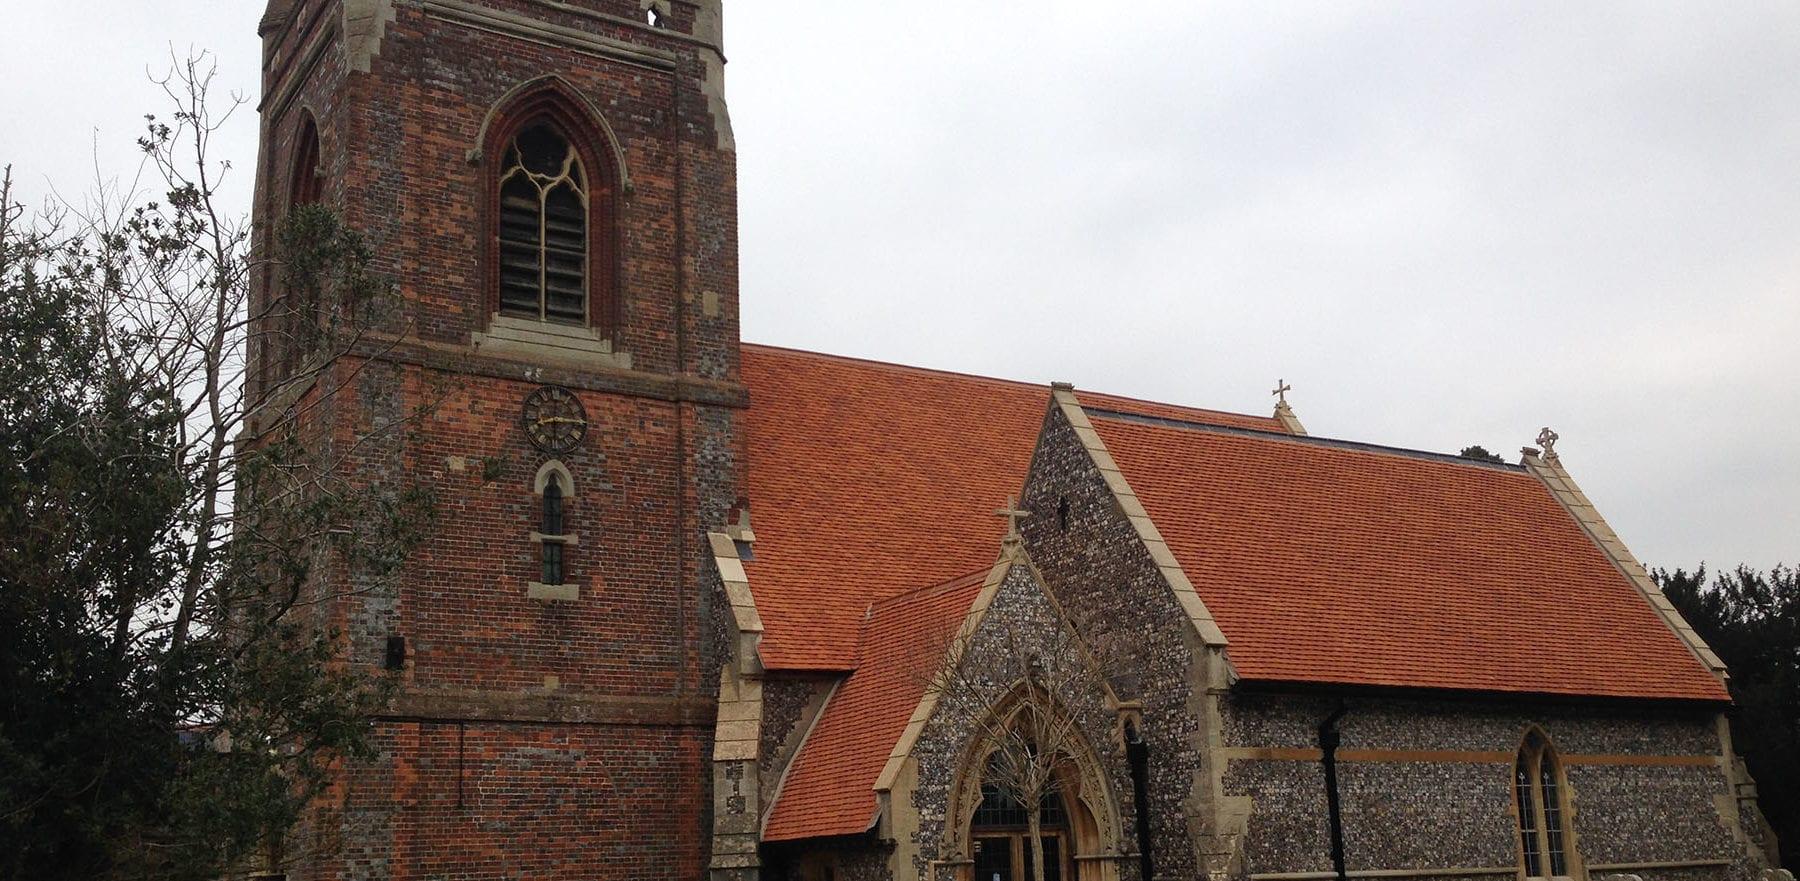 Lifestiles - Handmade Orange Clay Roof Tiles - Berkshire, England 2